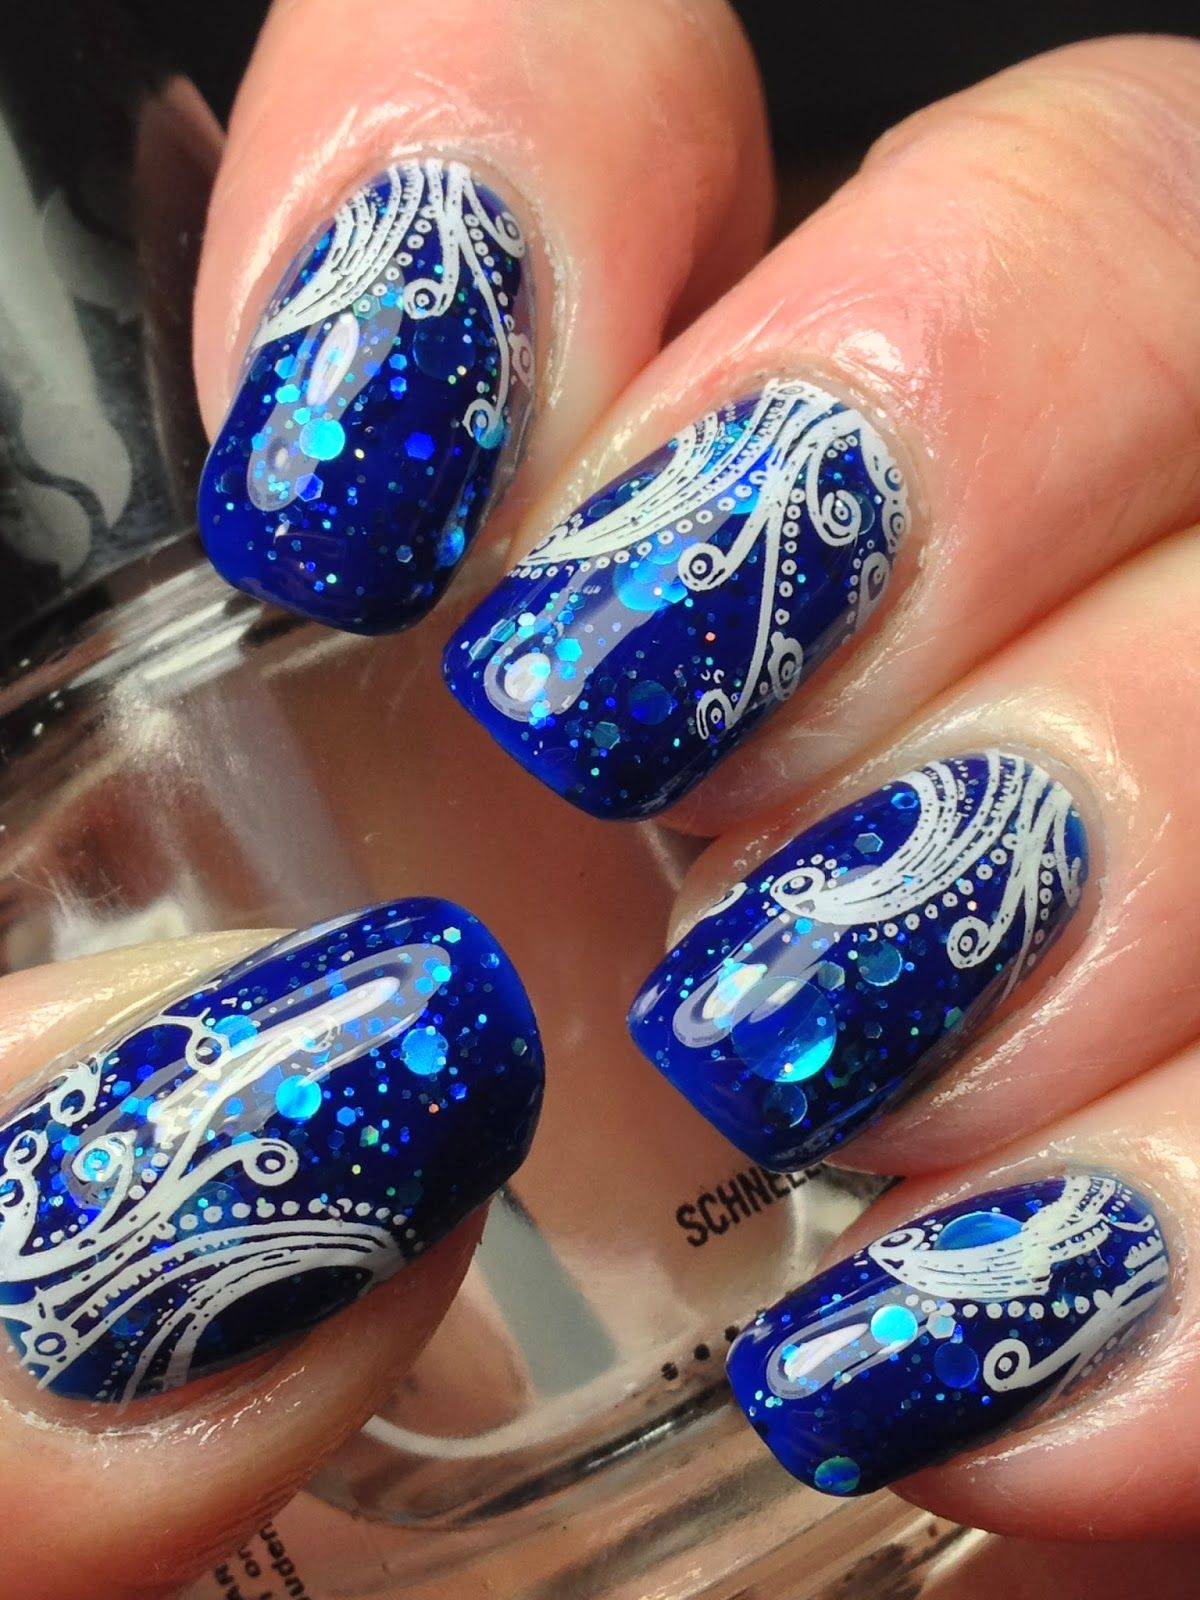 Different dimension da ba dee canadian nail fanatic nail nail